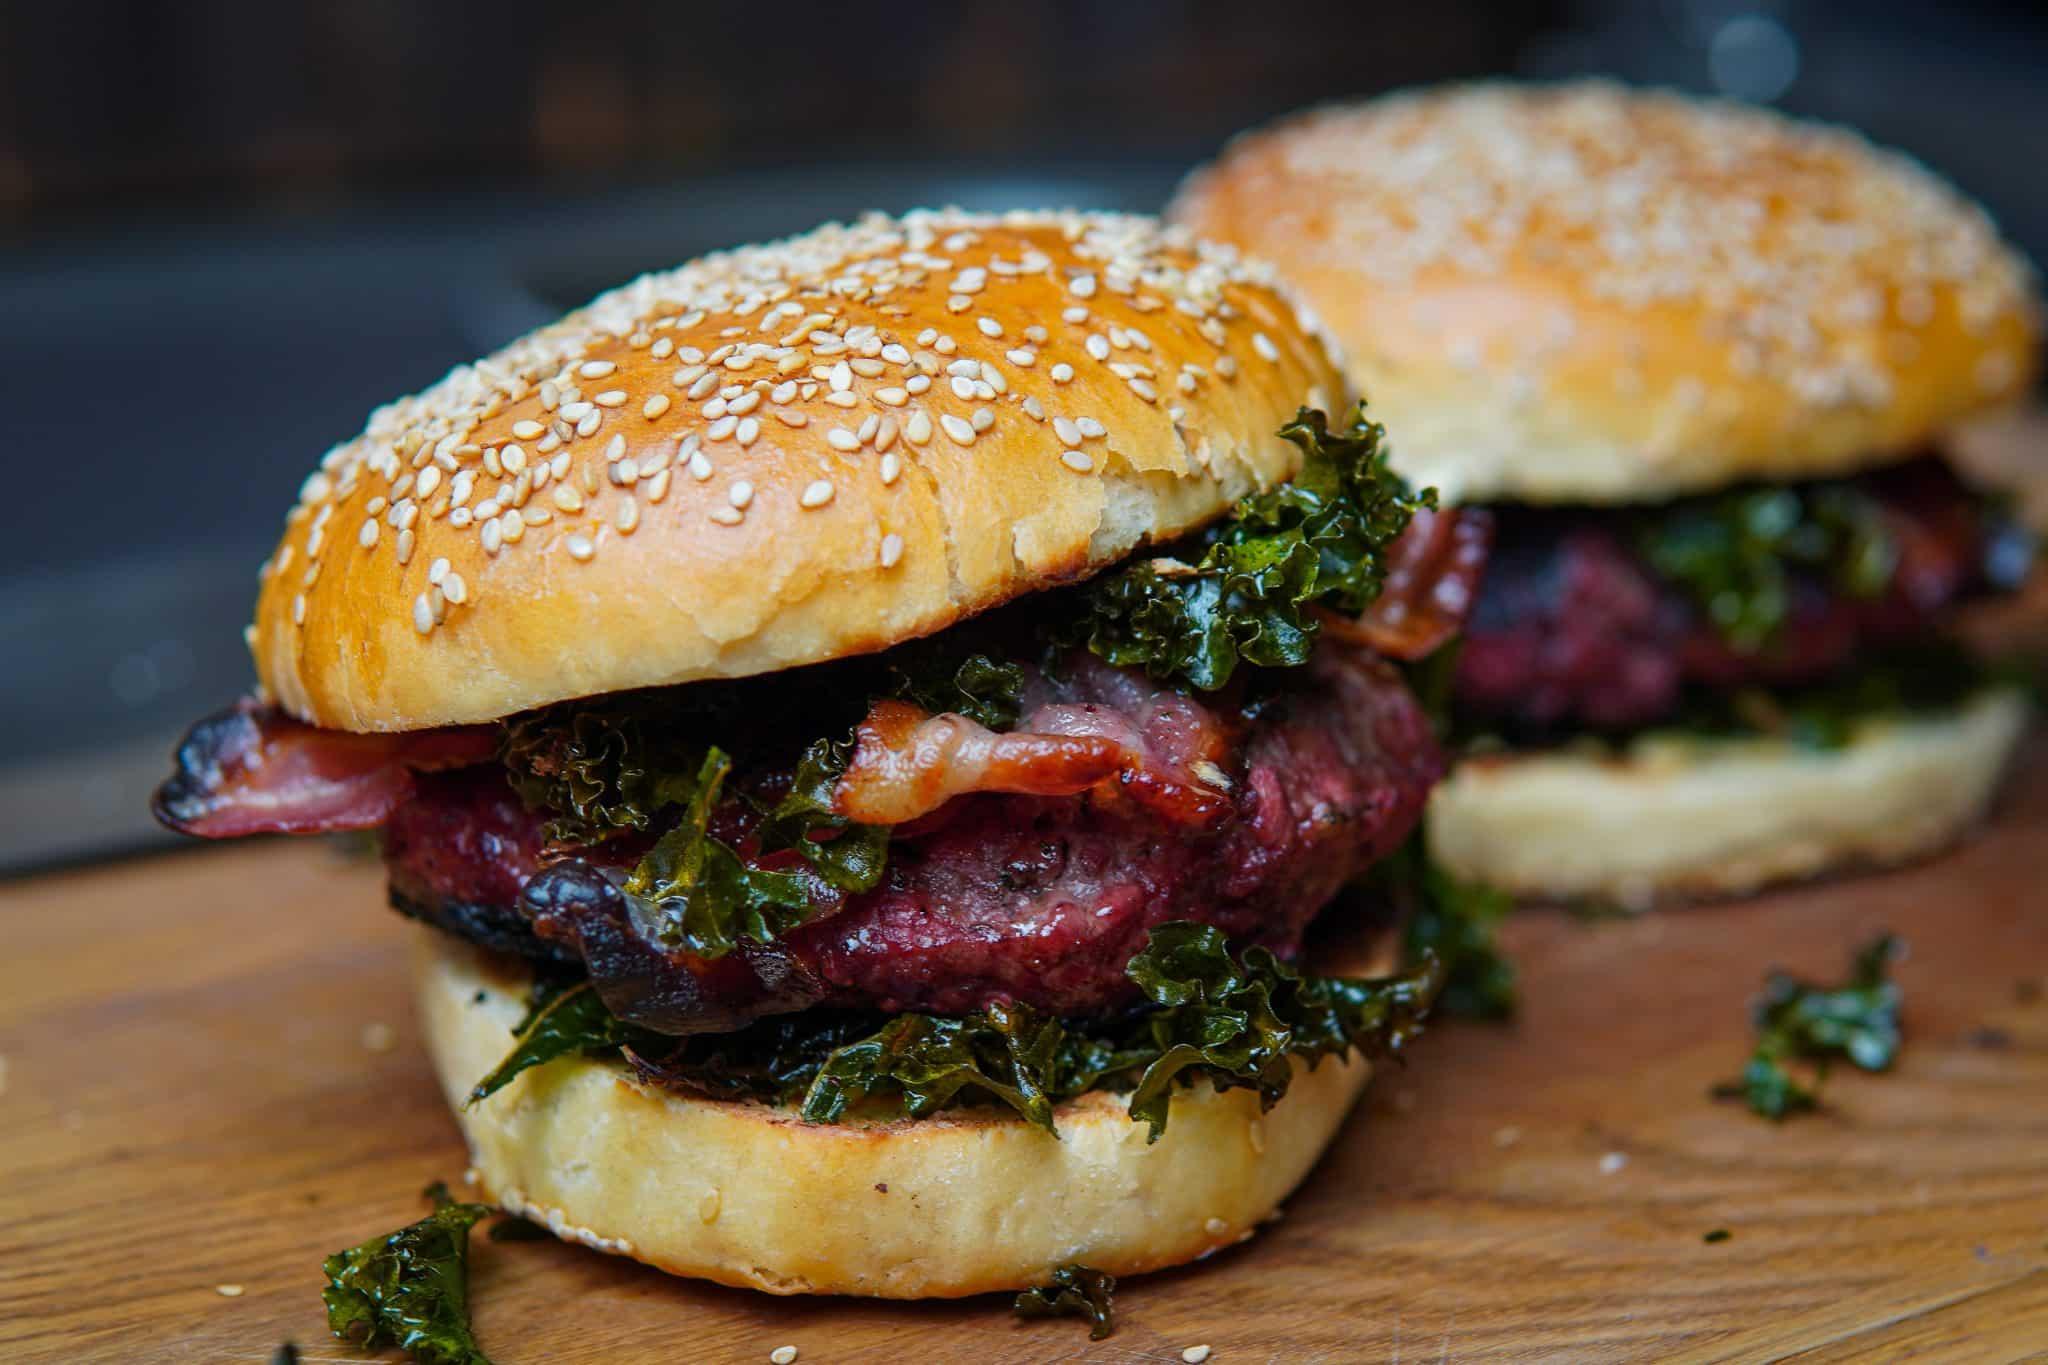 Grünkohl Burger Monolith Kamado